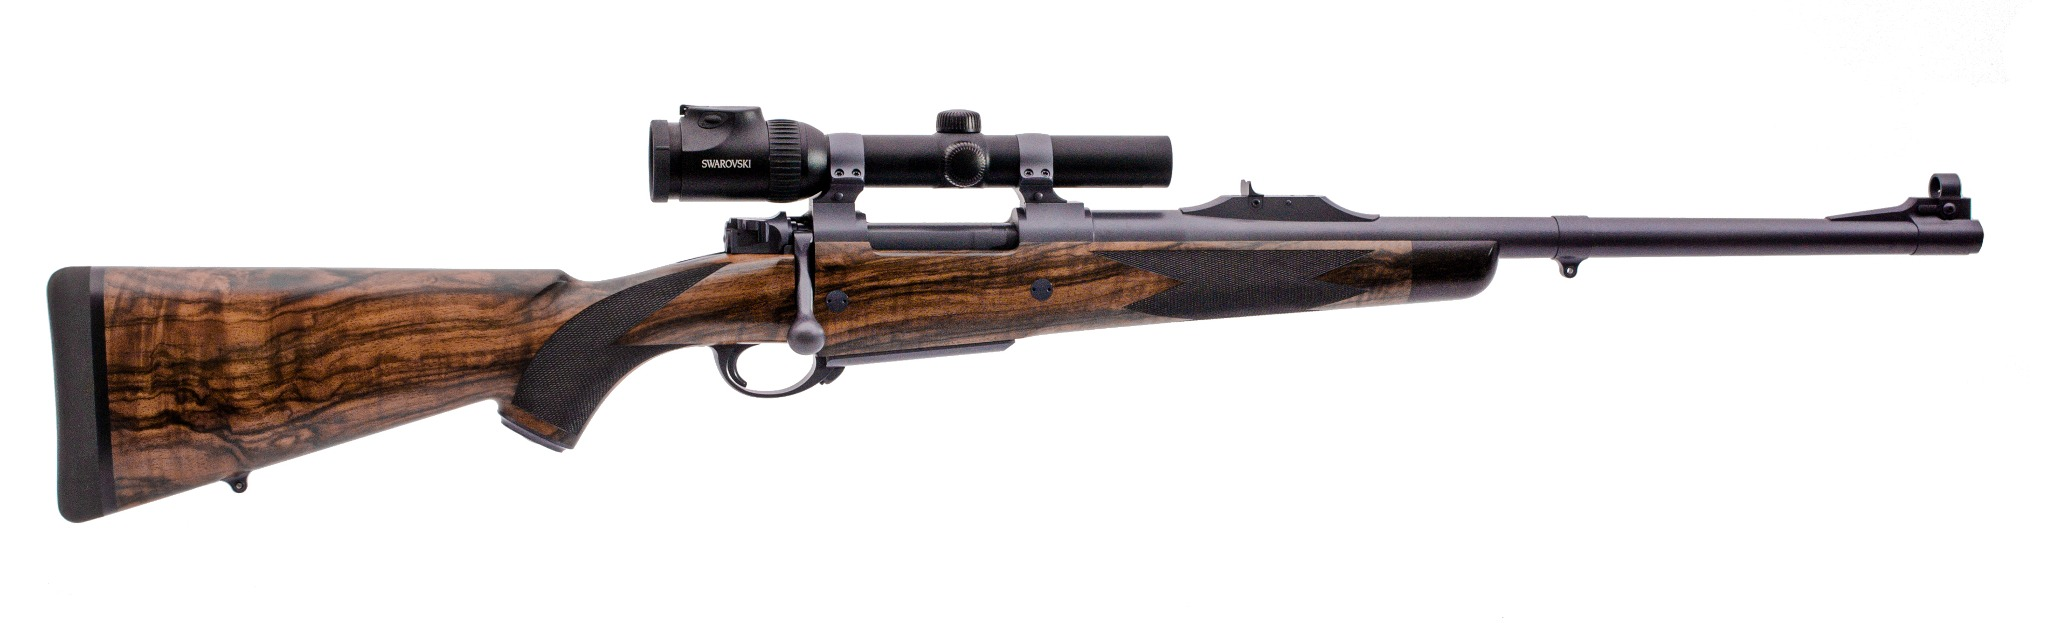 Ryan Breeding custom dangerous game rifle